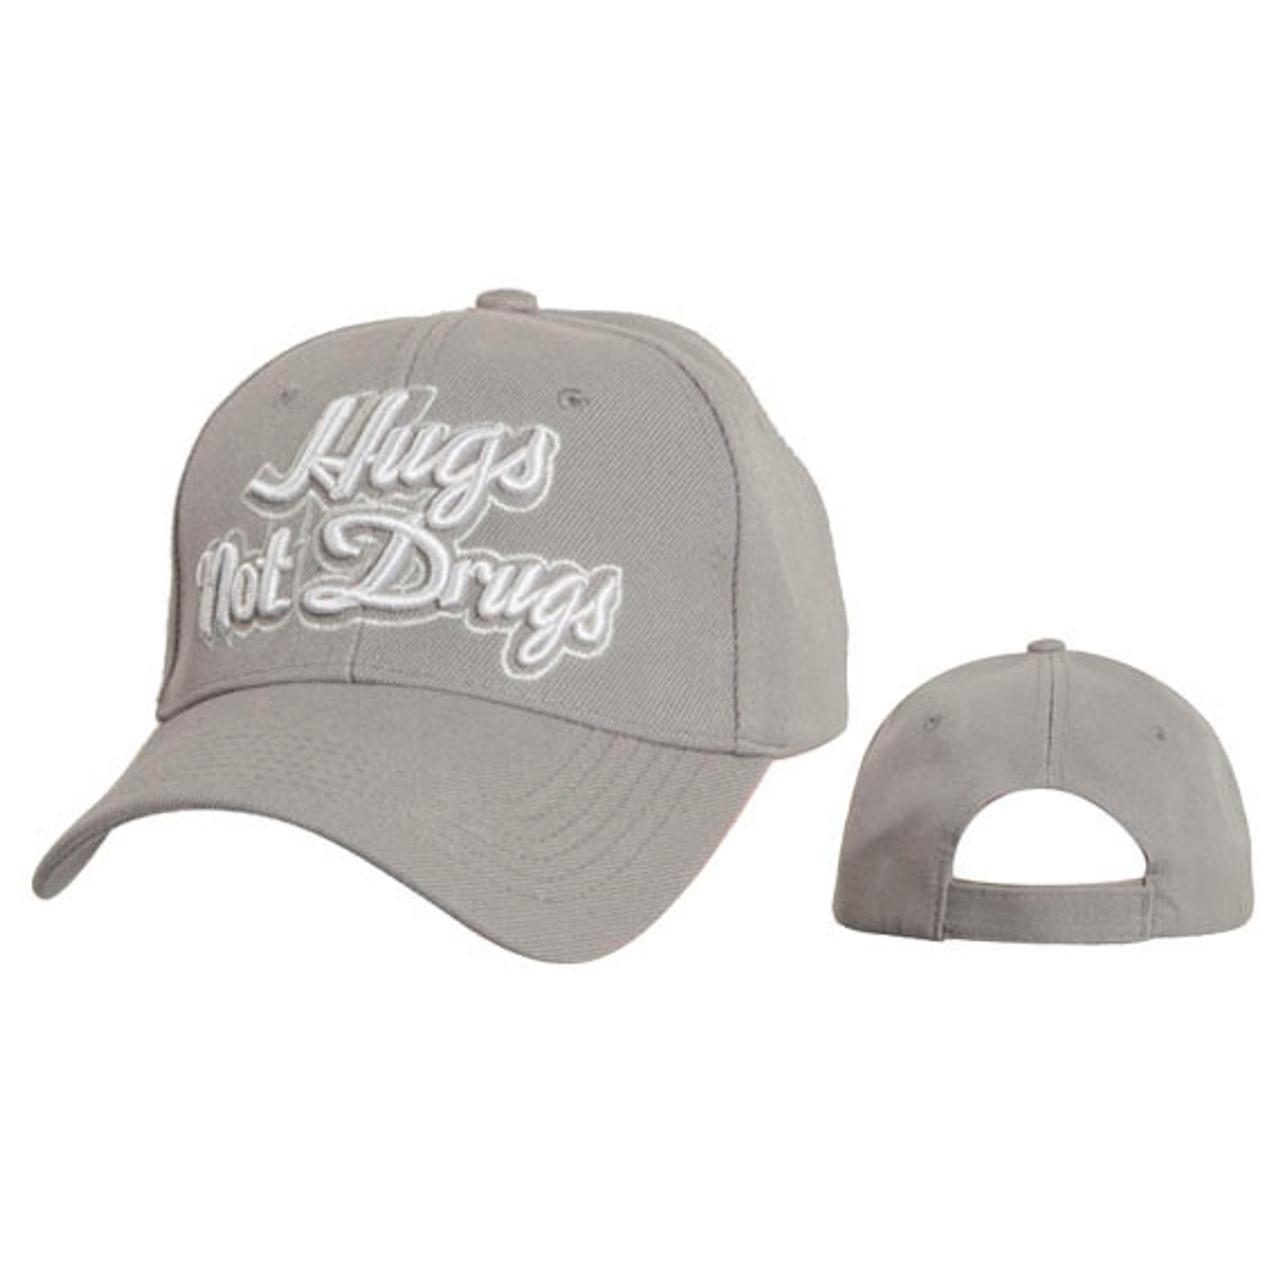 "Wholesale ""Hugs Not Drugs"" Baseball Caps Light Grey"